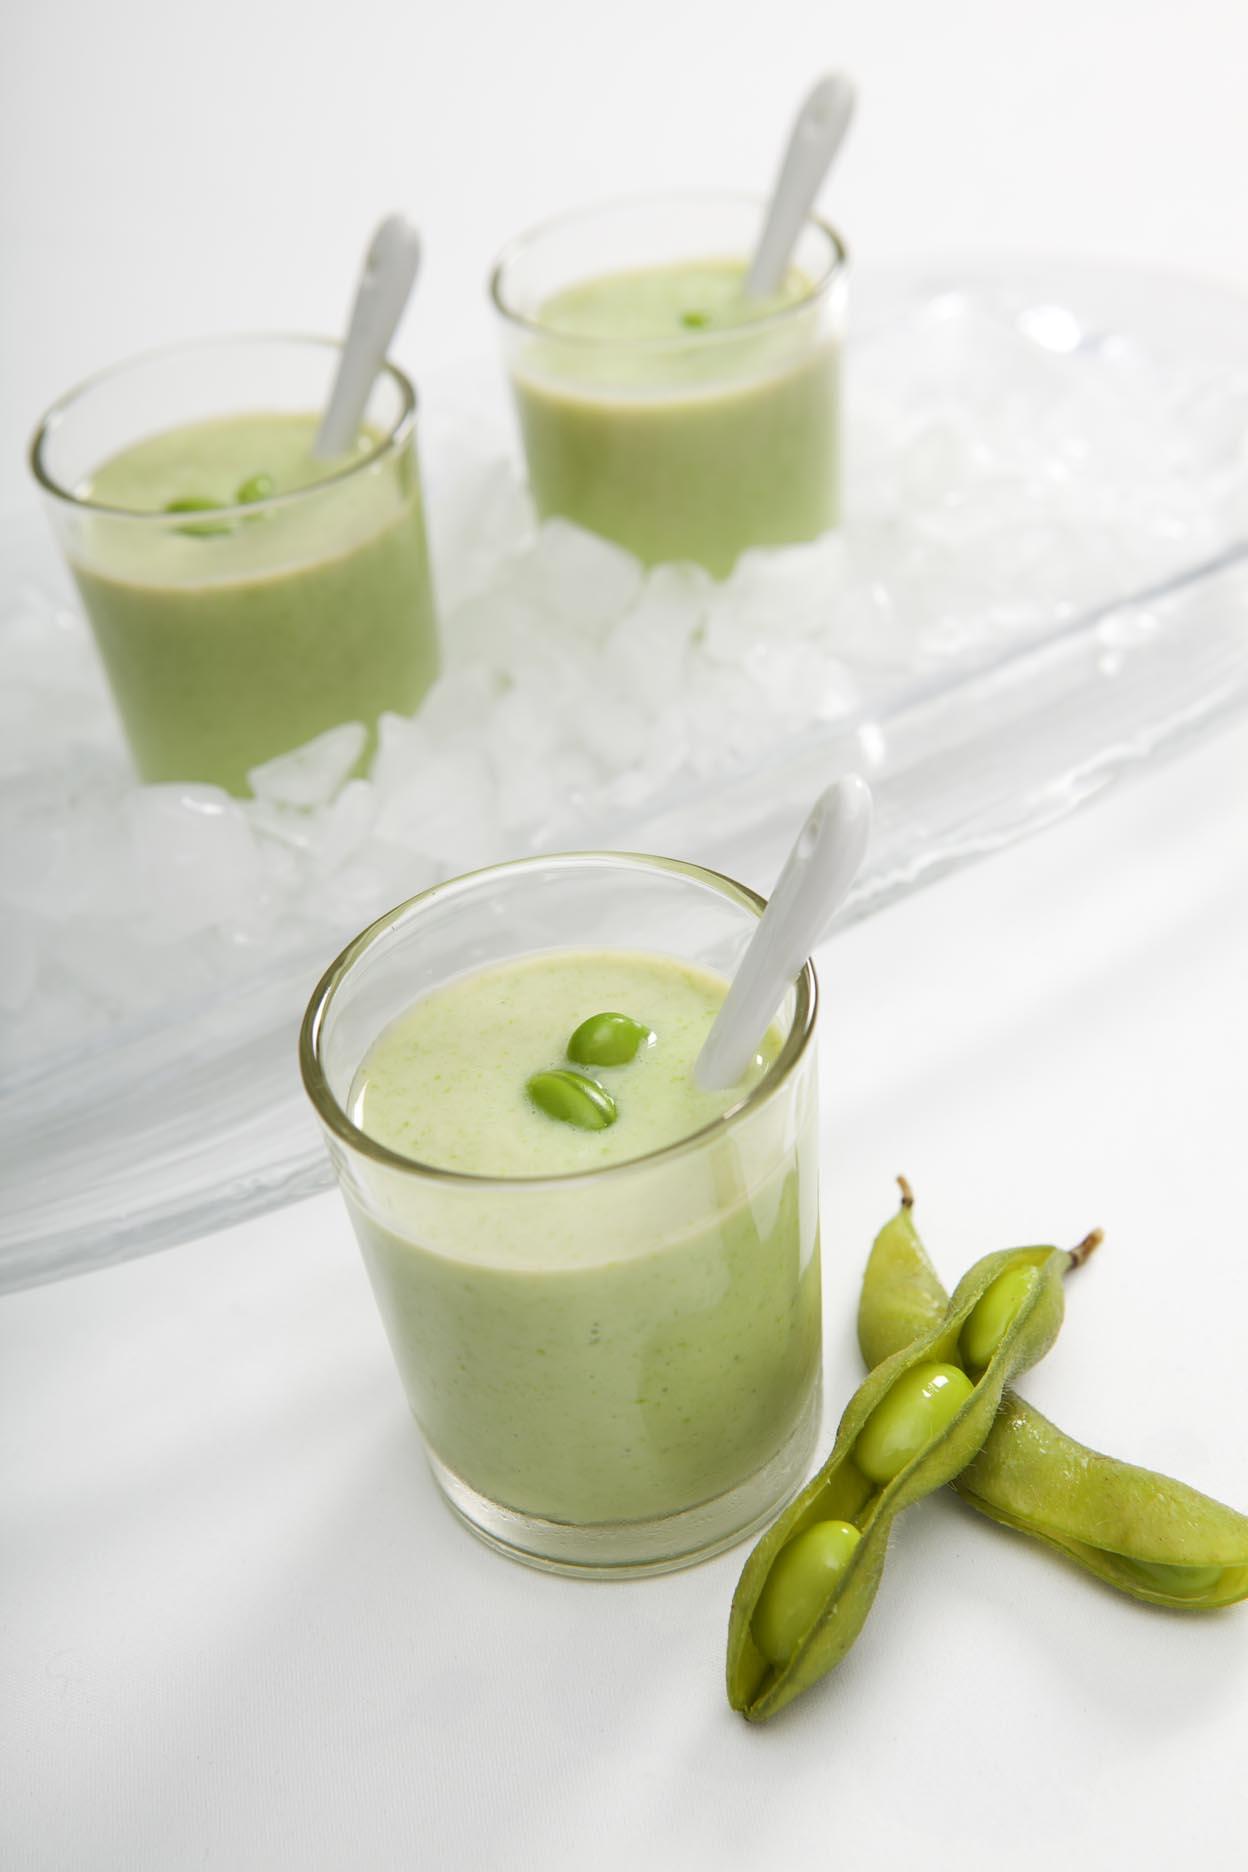 Japanese-Style-Edamame-Vichyssoise-sydney-vegetarian-cookingclass-vegan-glutenfree-cookingschool-healthy